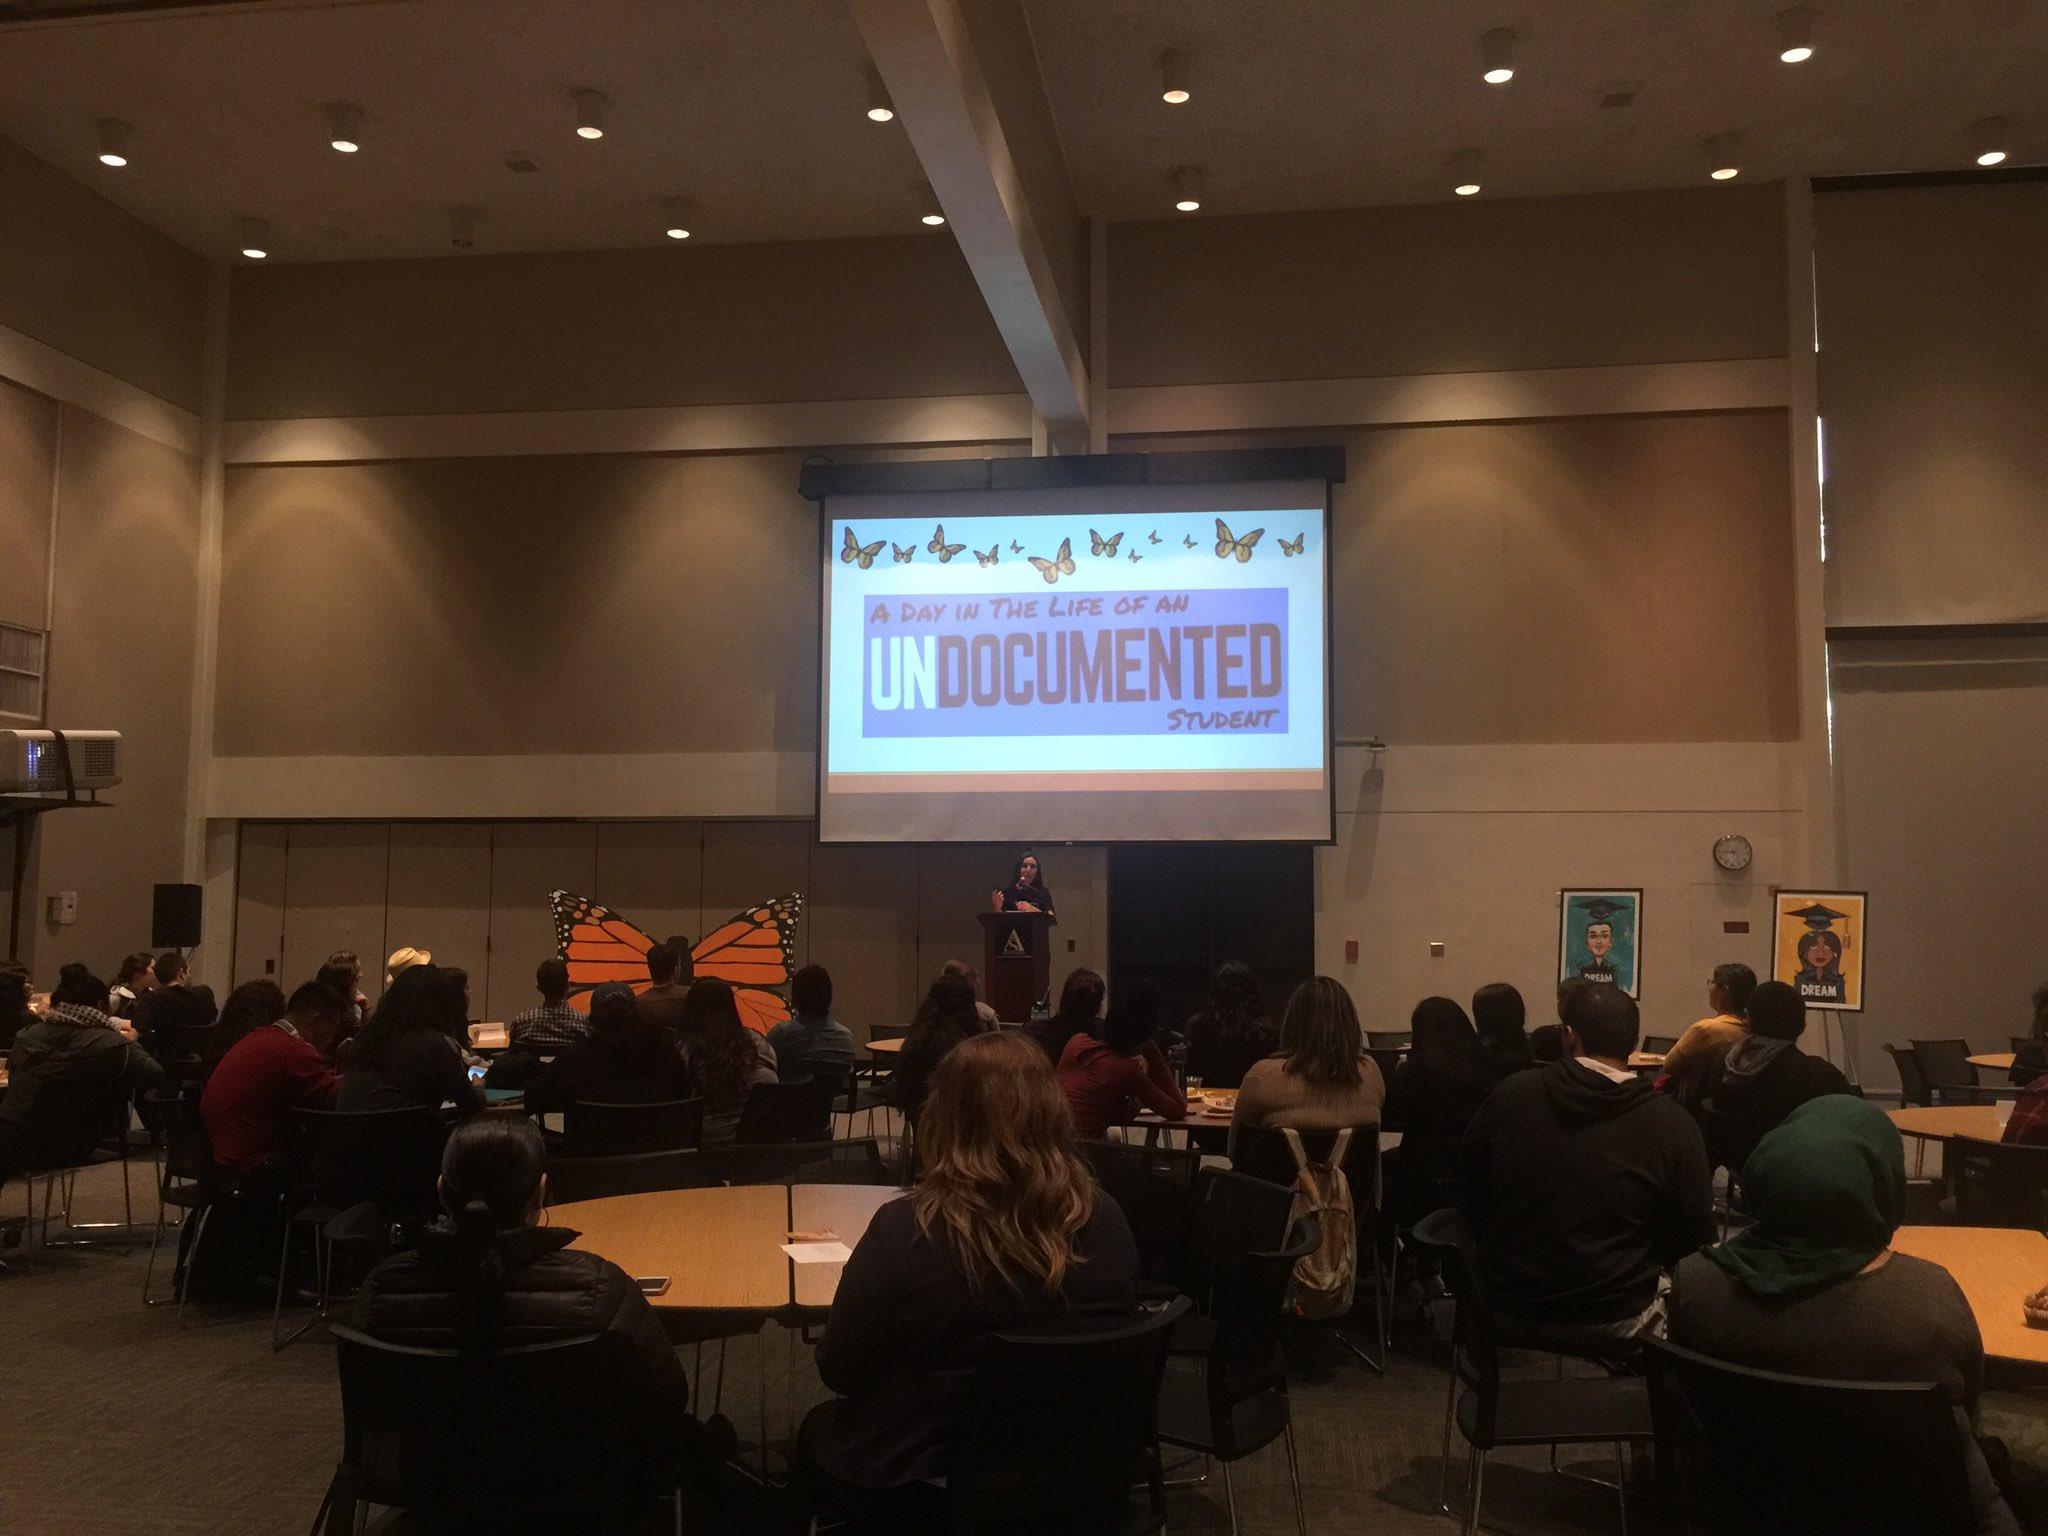 .@daily49er UCLA Alumni Blanca Villagomez shares her story as an undocumented student #49ernow #CSULB #undocumented https://t.co/C0Wg83047w